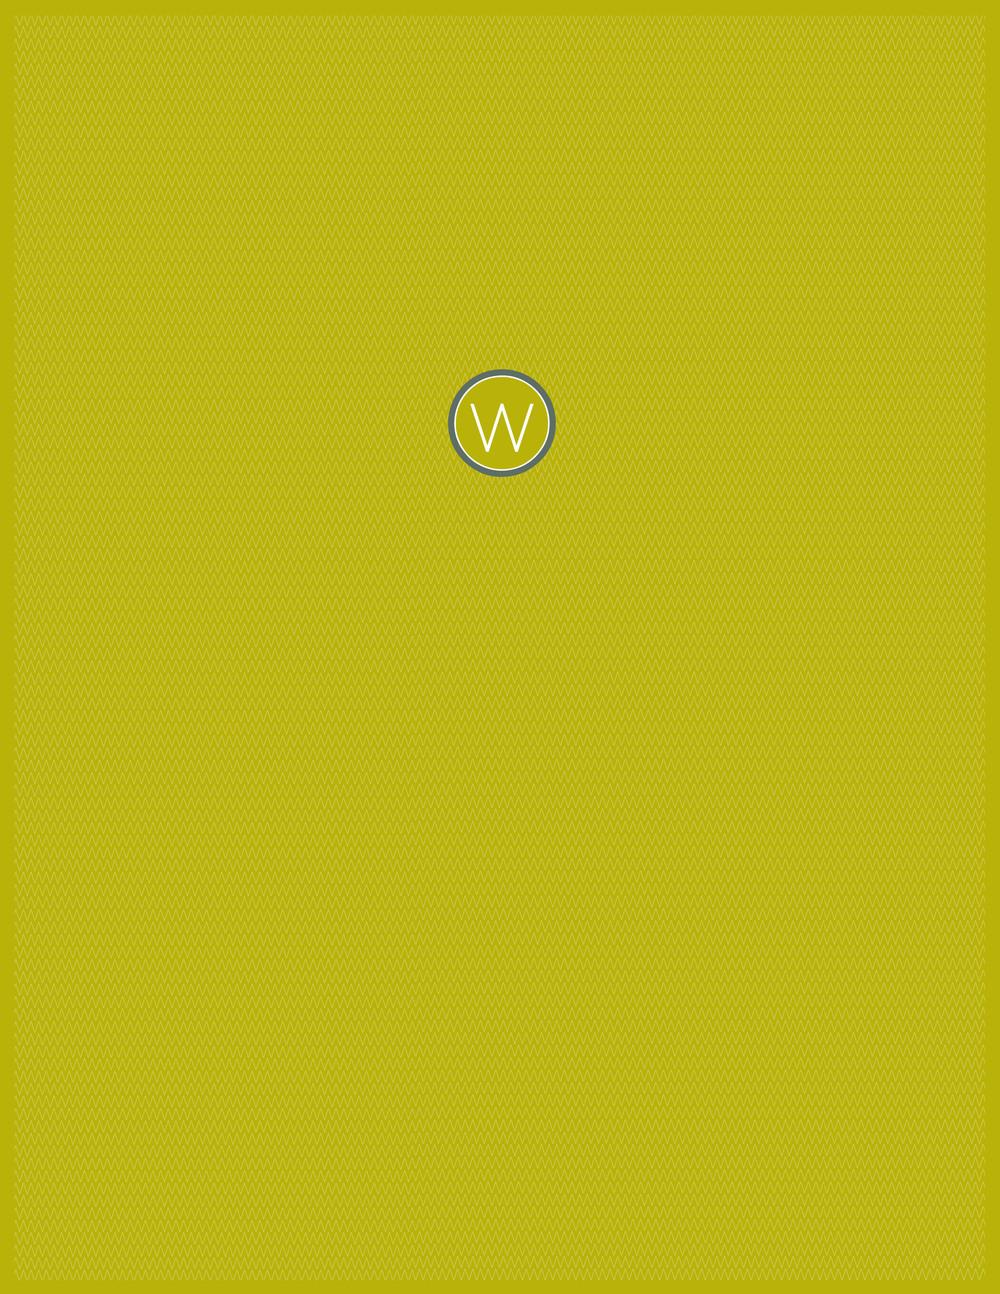 wissmach_letterhead_back.jpg